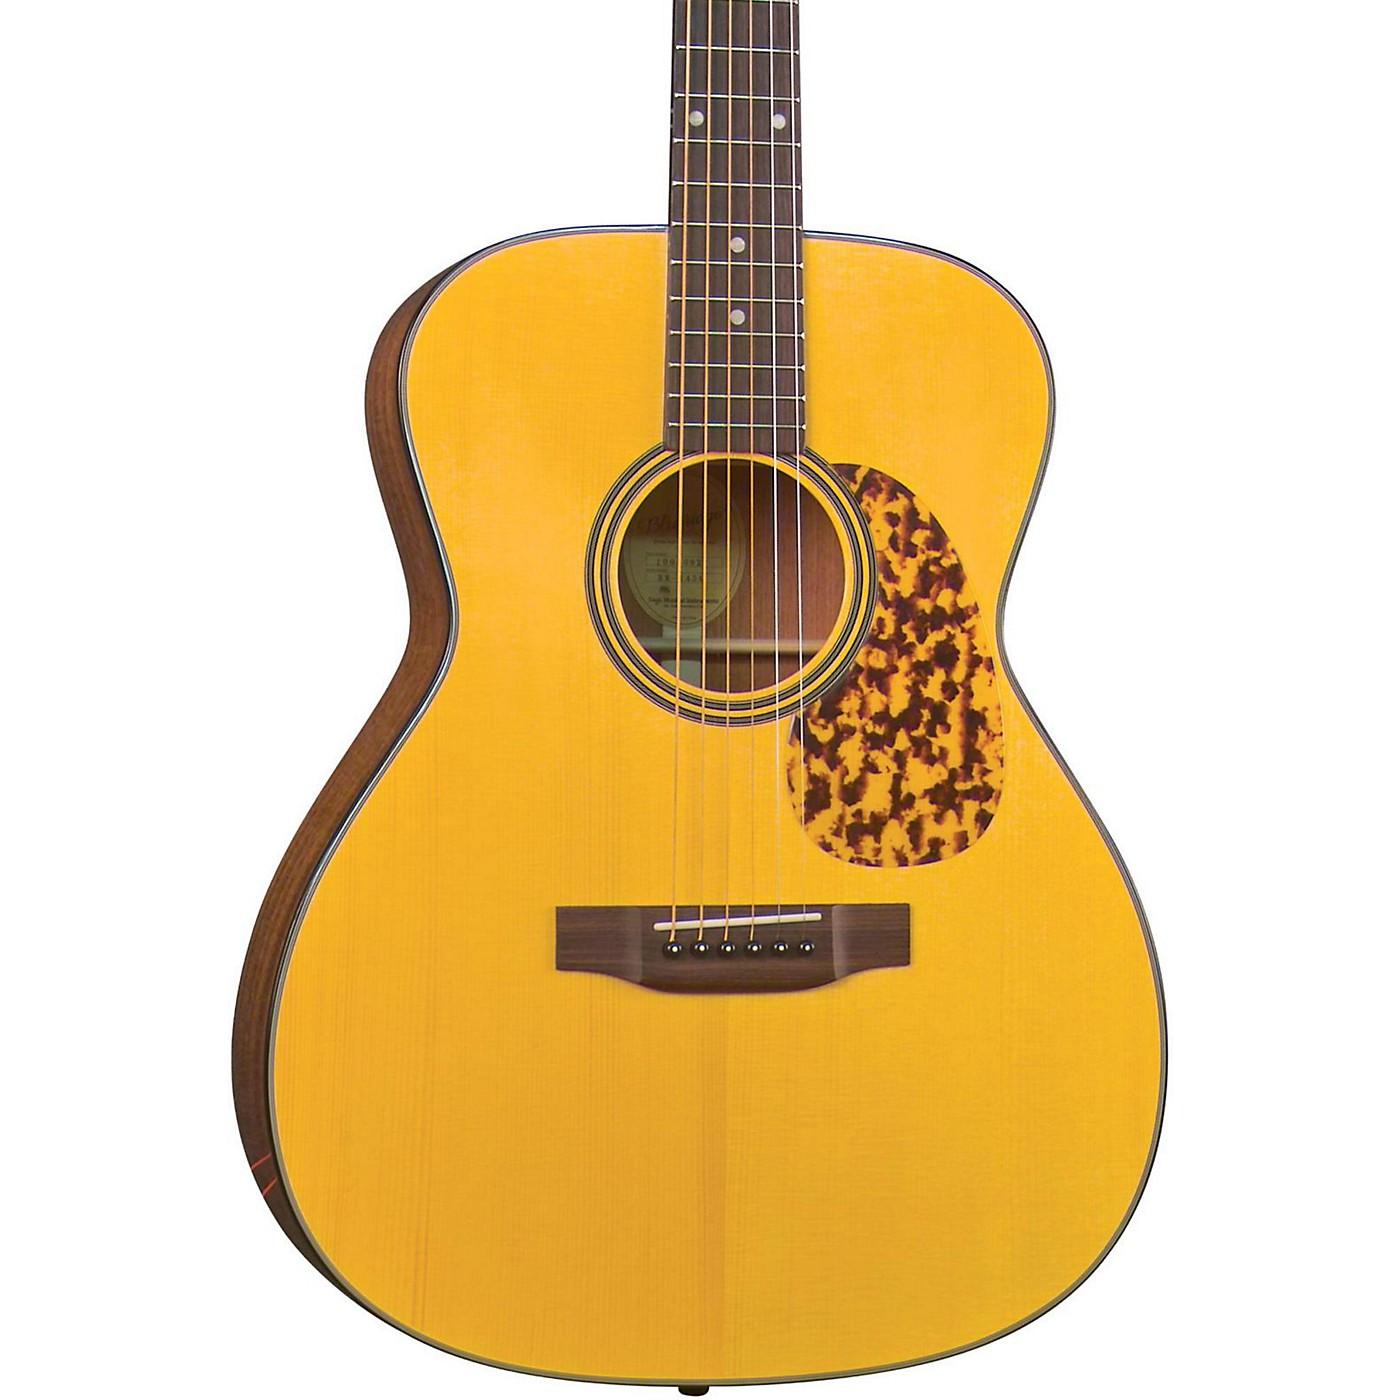 Blueridge BR-143A Adirondack Top Craftsman Series 000 Acoustic Guitar thumbnail